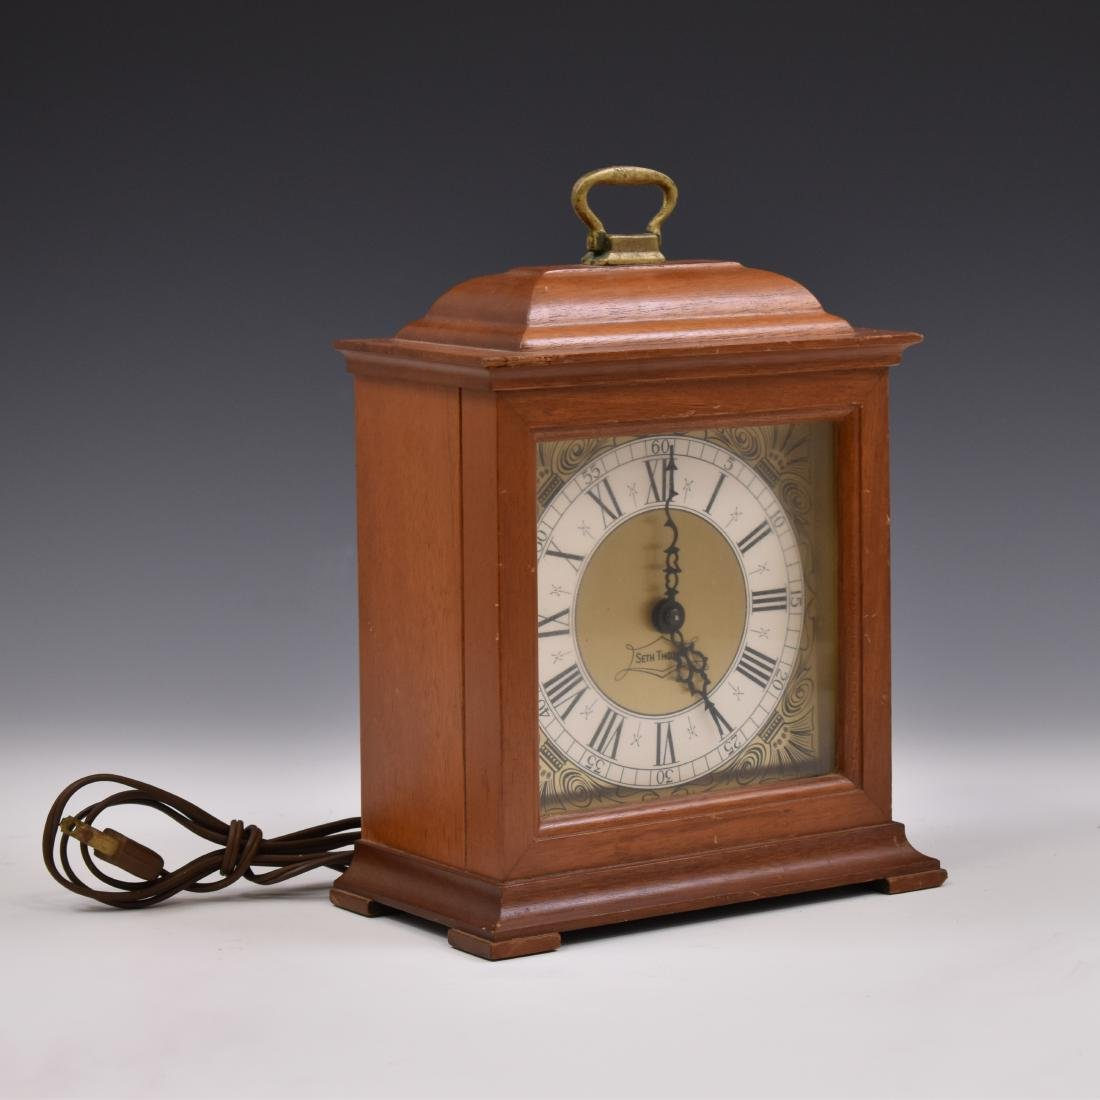 1960 SETH THOMAS BRACKET ELECTRIC CLOCK